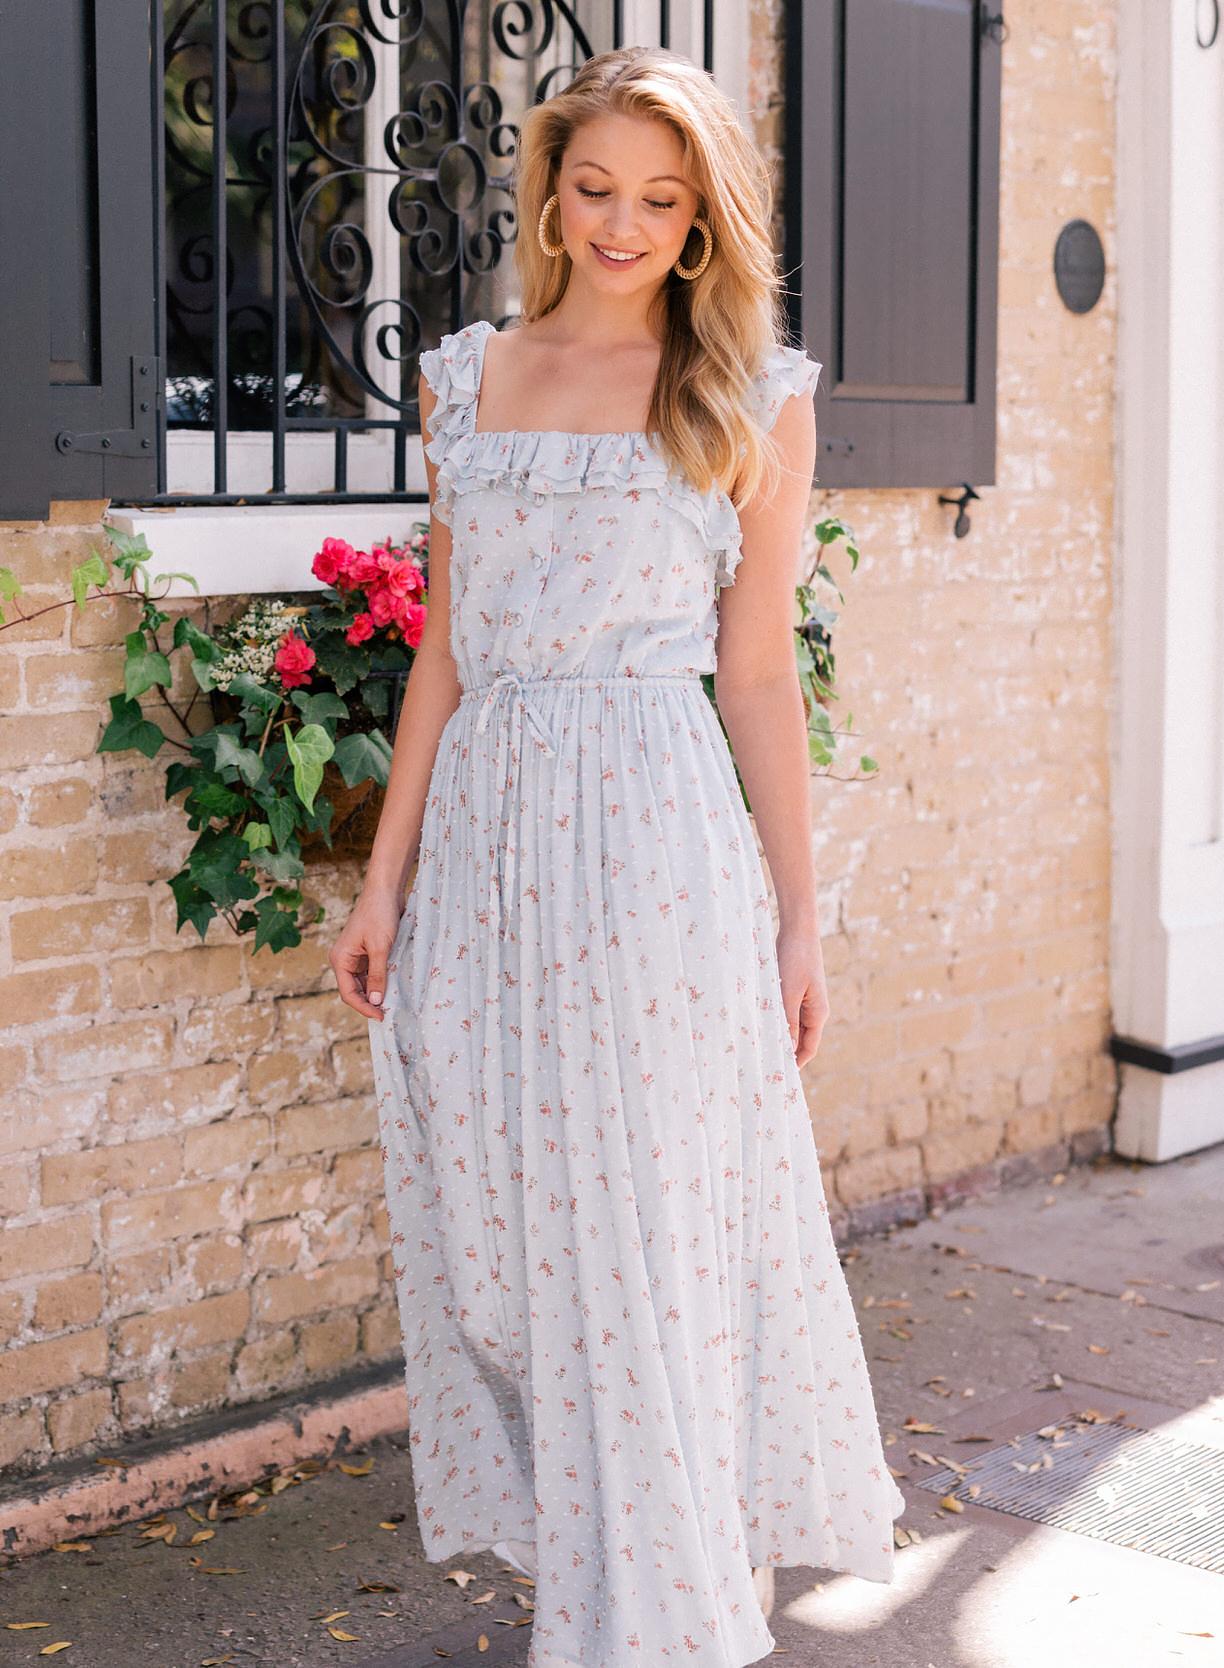 5e85fad509ab Gal Meets Glam x Stitch Fix S-S 2019 Dresses, Jumpsuits: Details